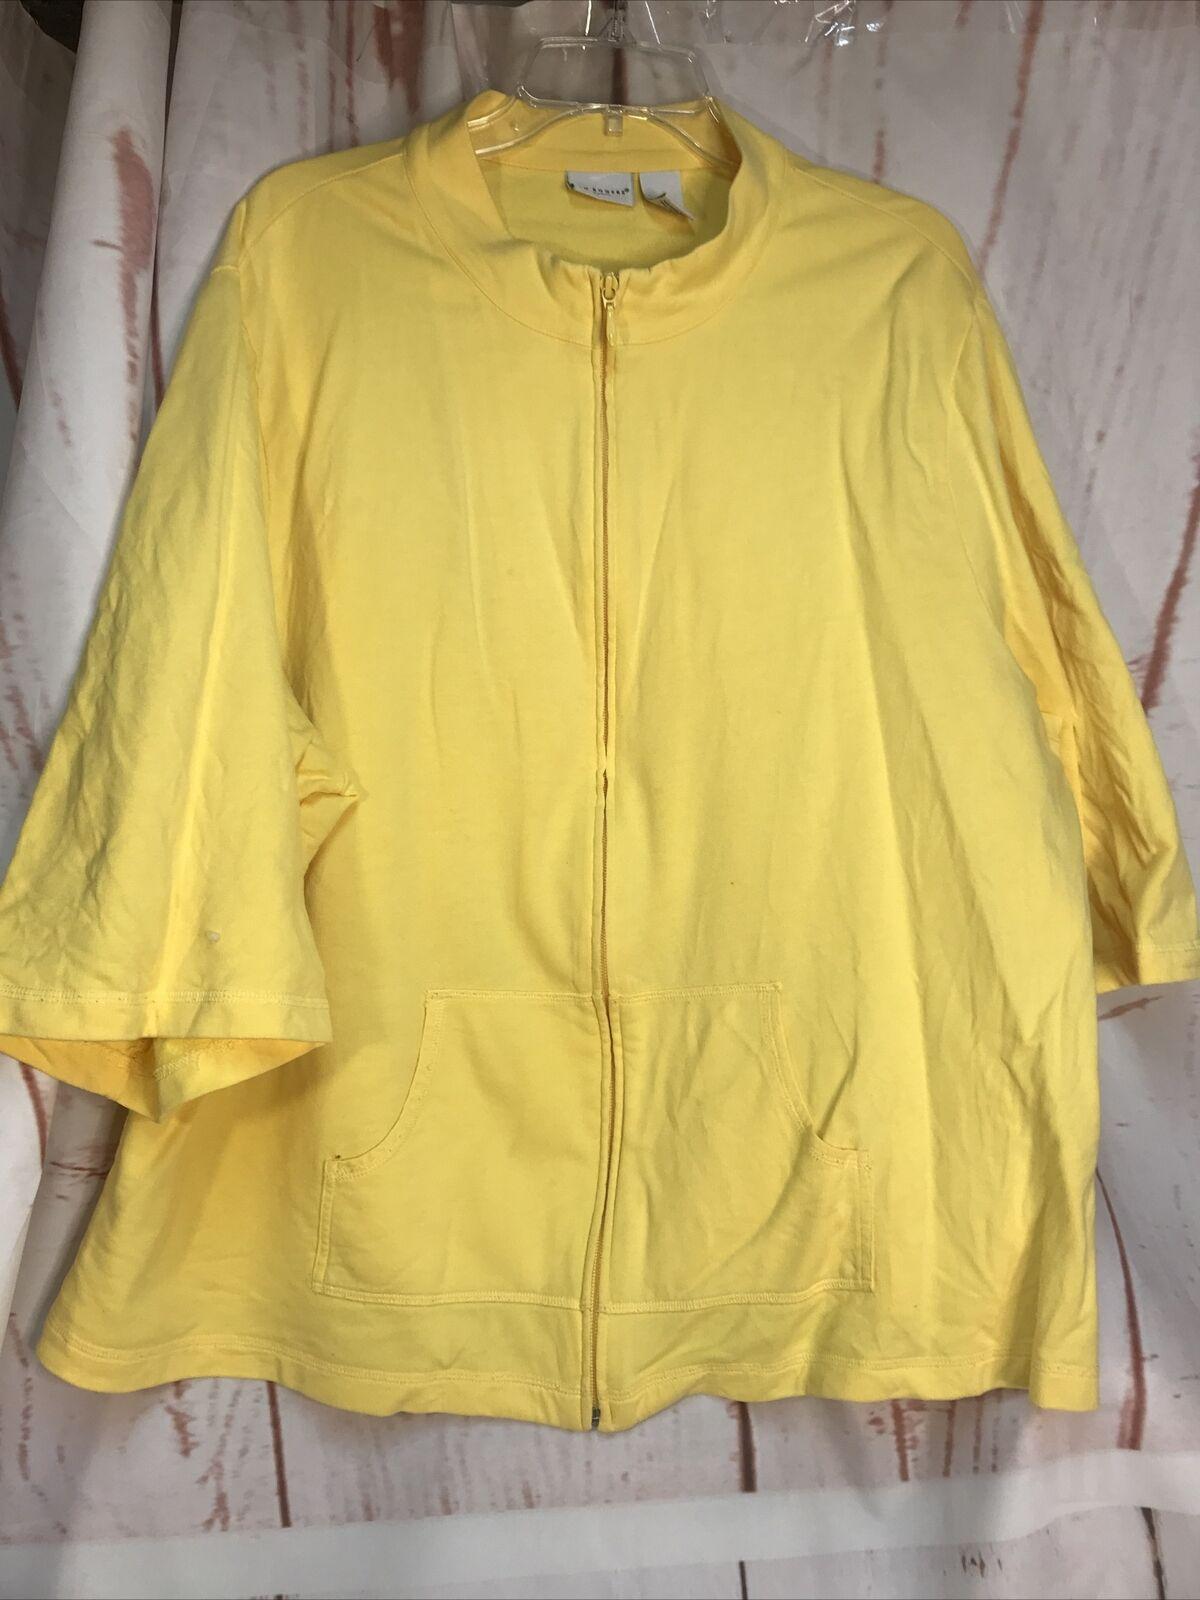 WOMAN 3 X FULL ZIP JACKET Yellow 3/4 Sleeve Kim Rogers Hand Warmer Pockets